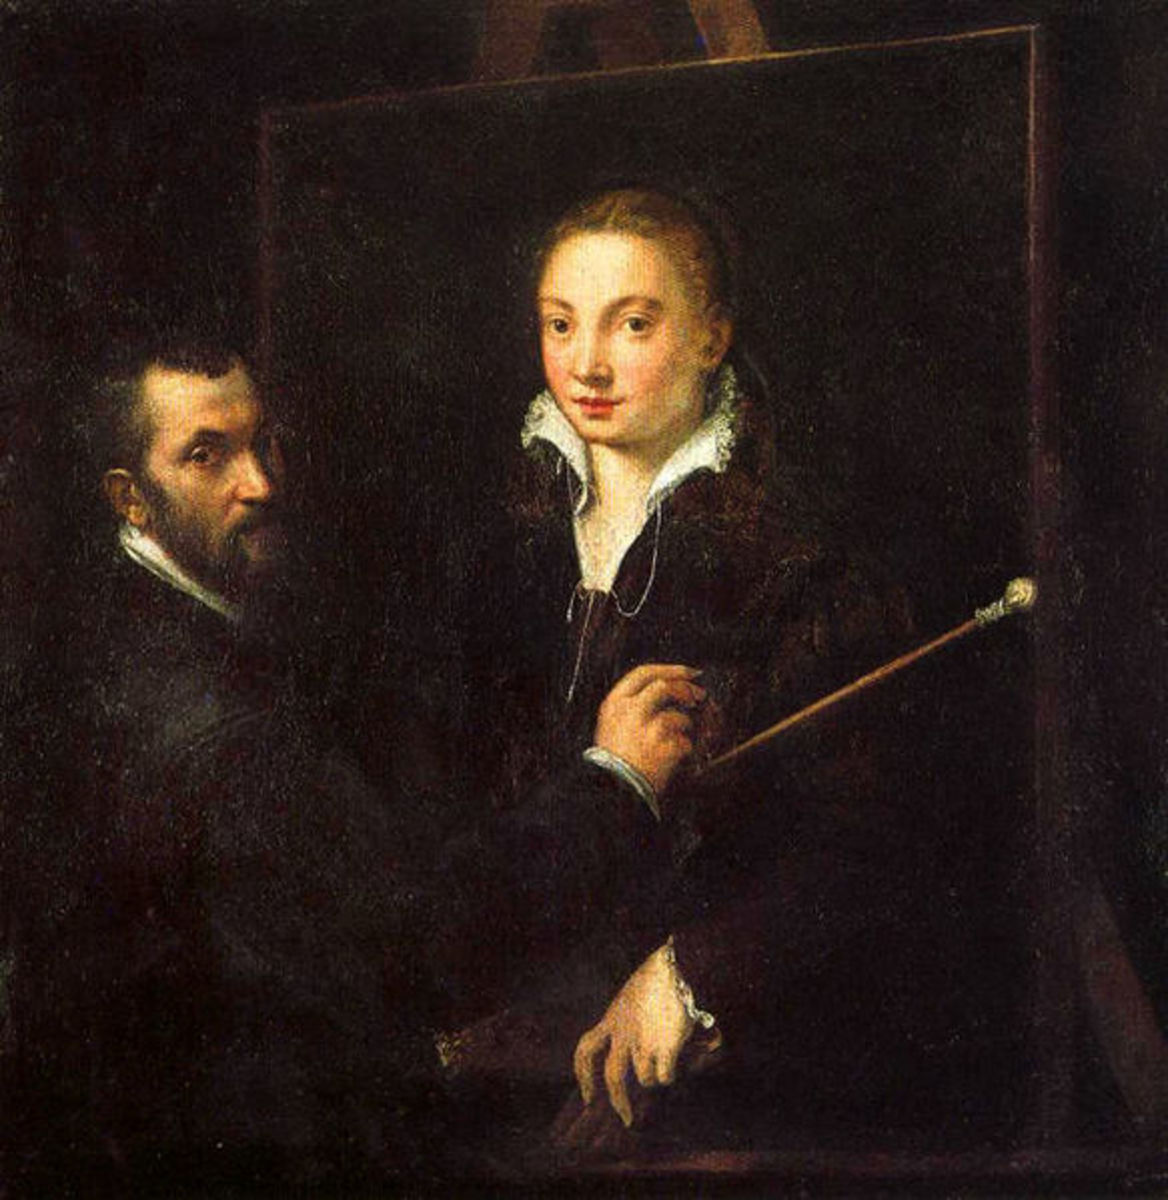 Self Portrait with Bernardino Campi, Siena, Pinacoteca Nazionale